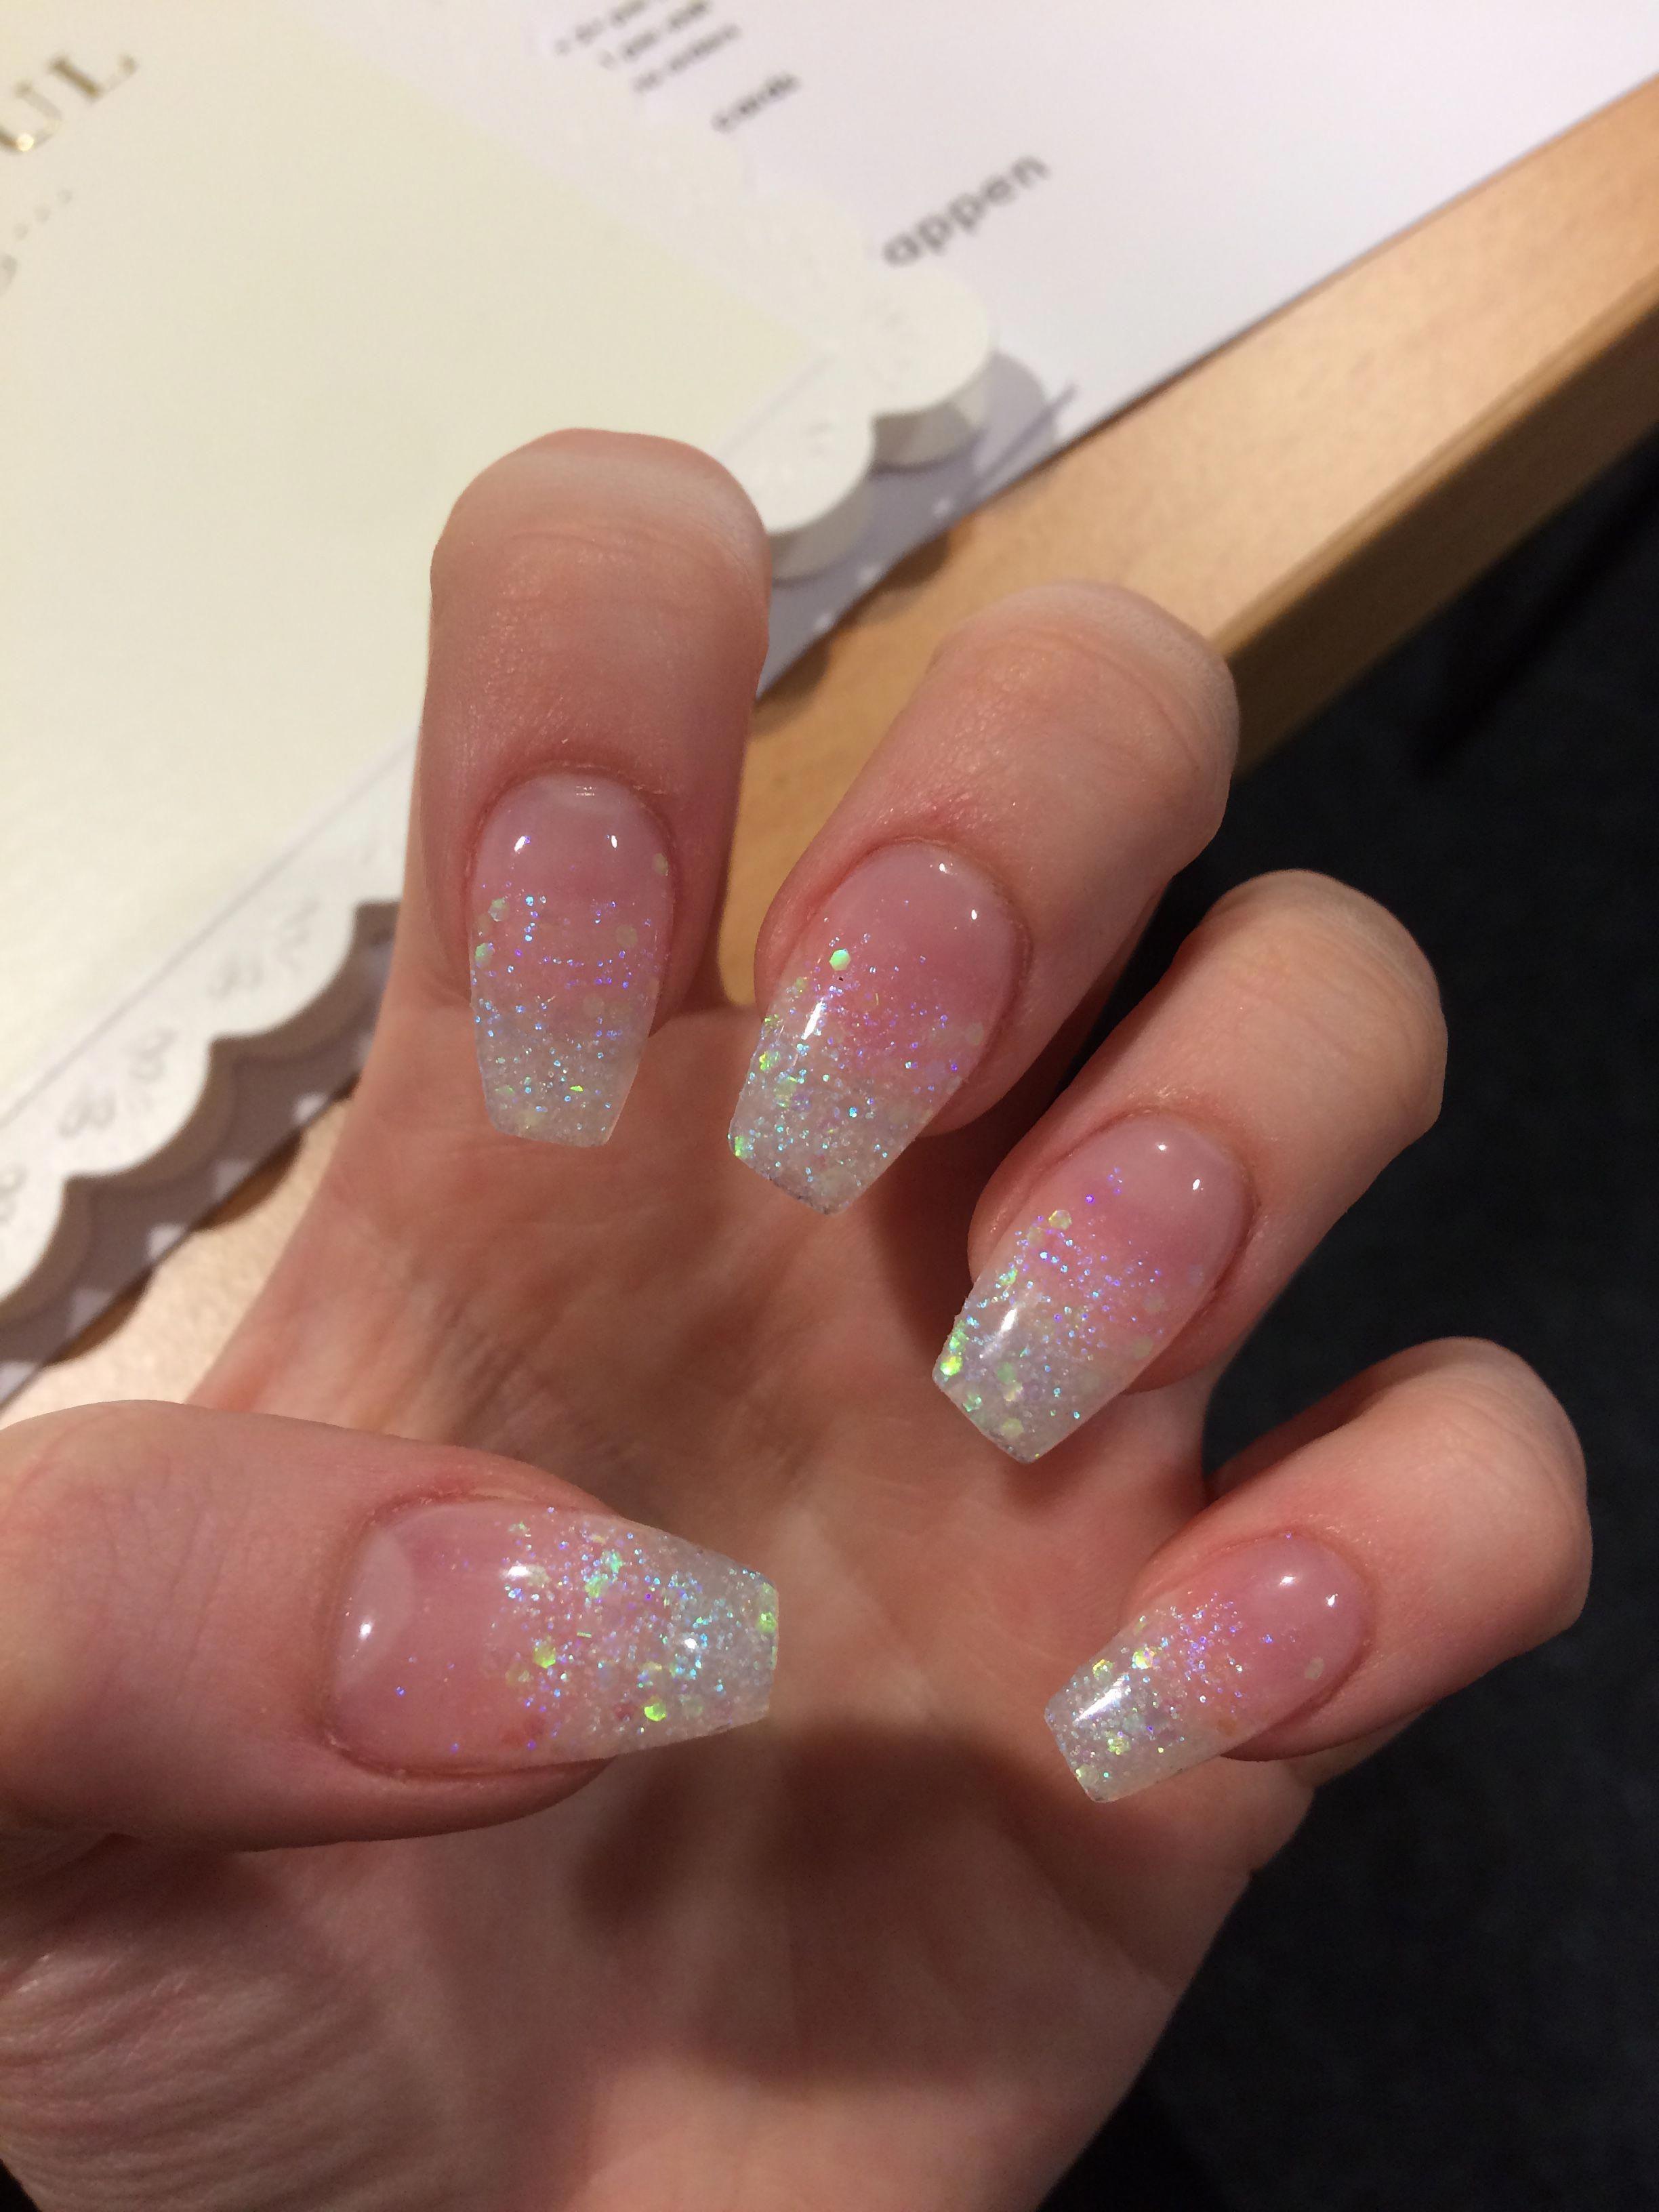 Glitter Ombre Acryl Doodskist Nagels Glitternails In 2020 Ombre Acrylic Nails Simple Acrylic Nails Short Acrylic Nails Designs